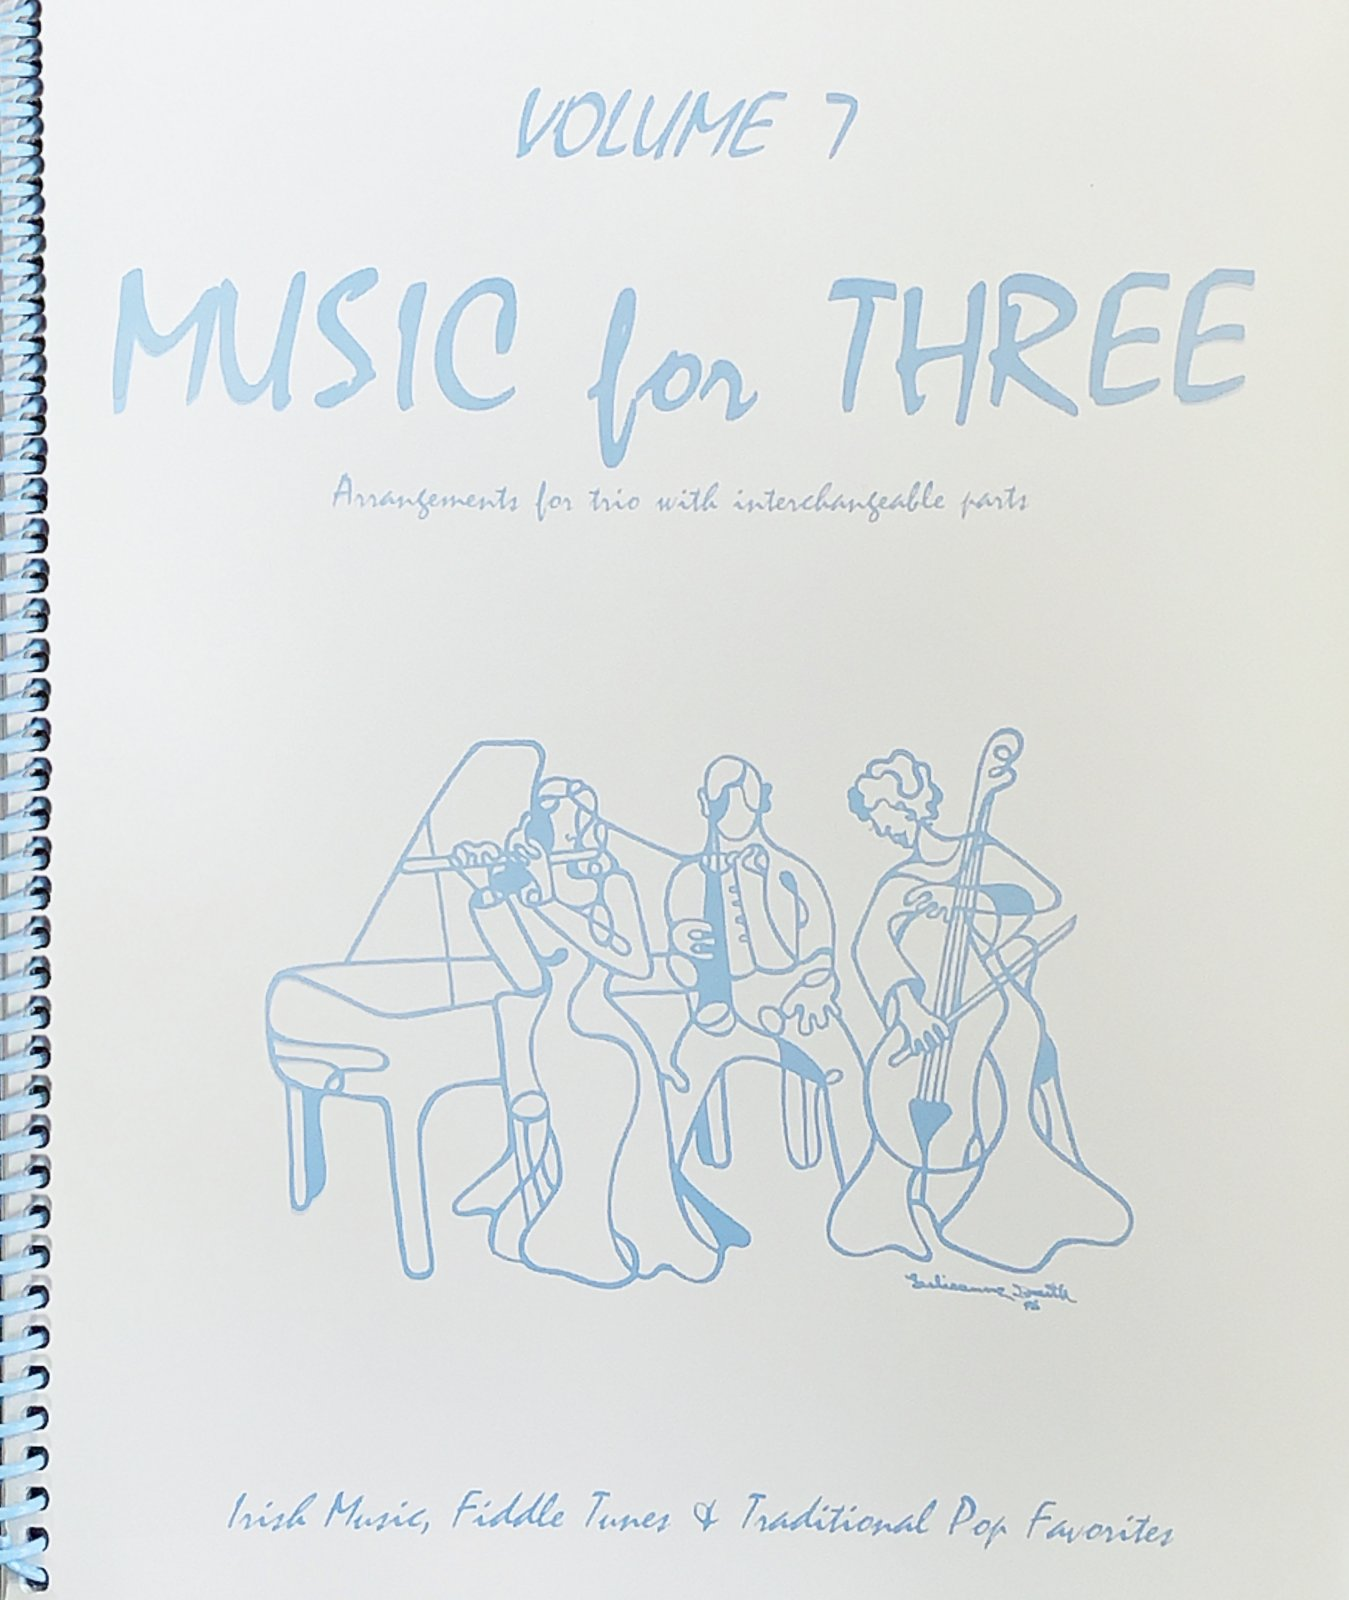 Music for Three Vol 7 Pt 2 - Viola - Kelley - Last Resort